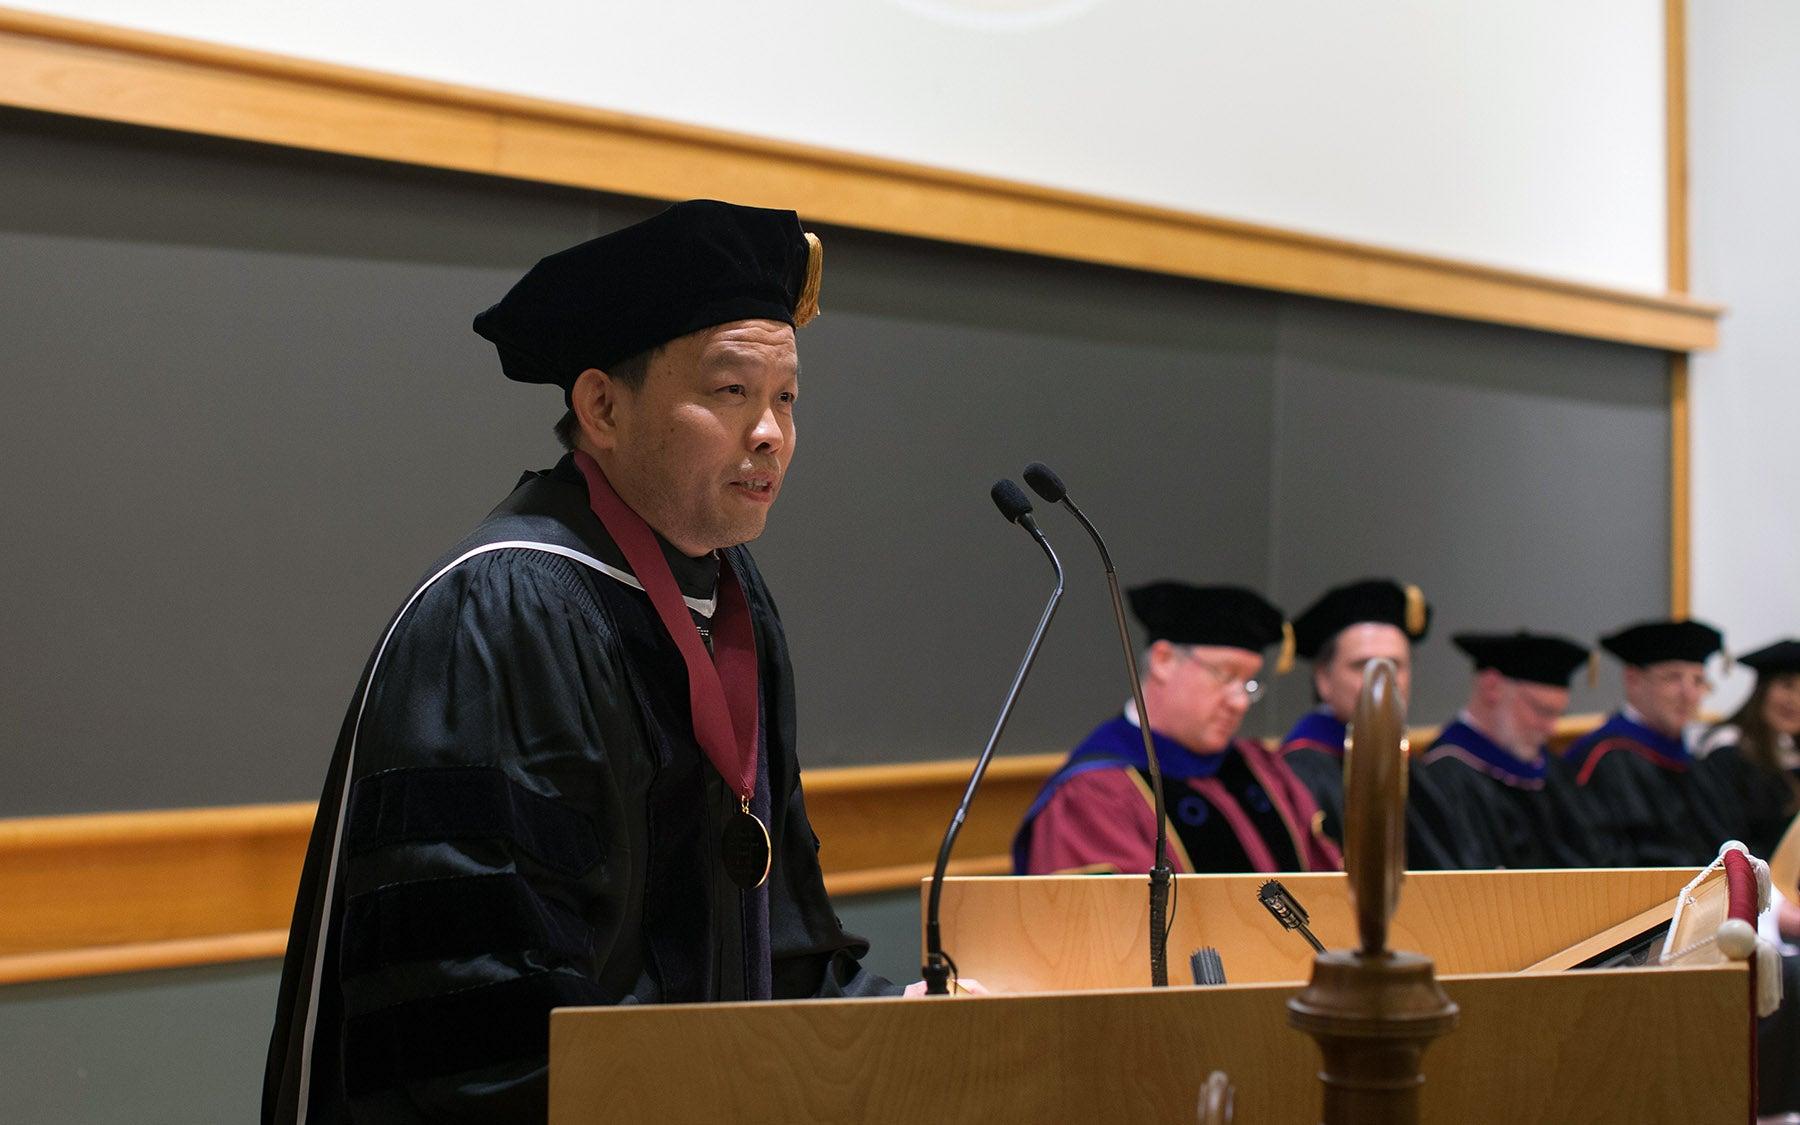 Bo Li WSBS Graduation Winship Herr Award